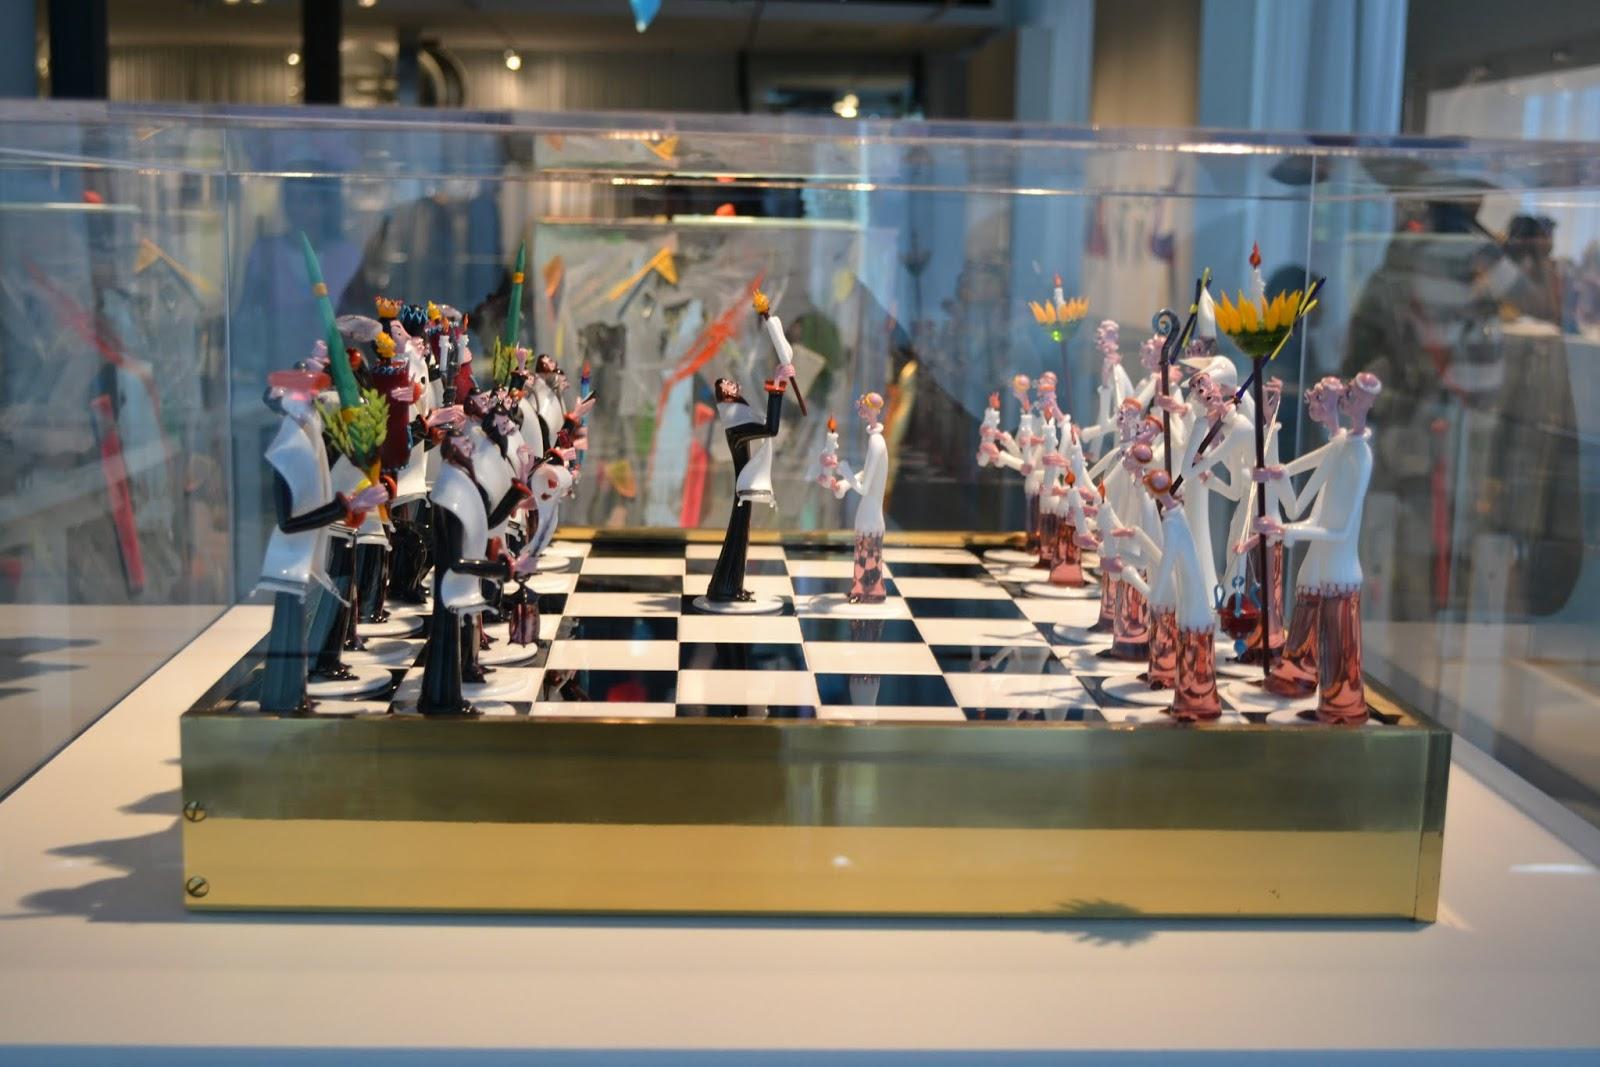 Музей стекла в Корнинг, штат Нью-Йорк (Corning Museum of Glass, Corning, New York)